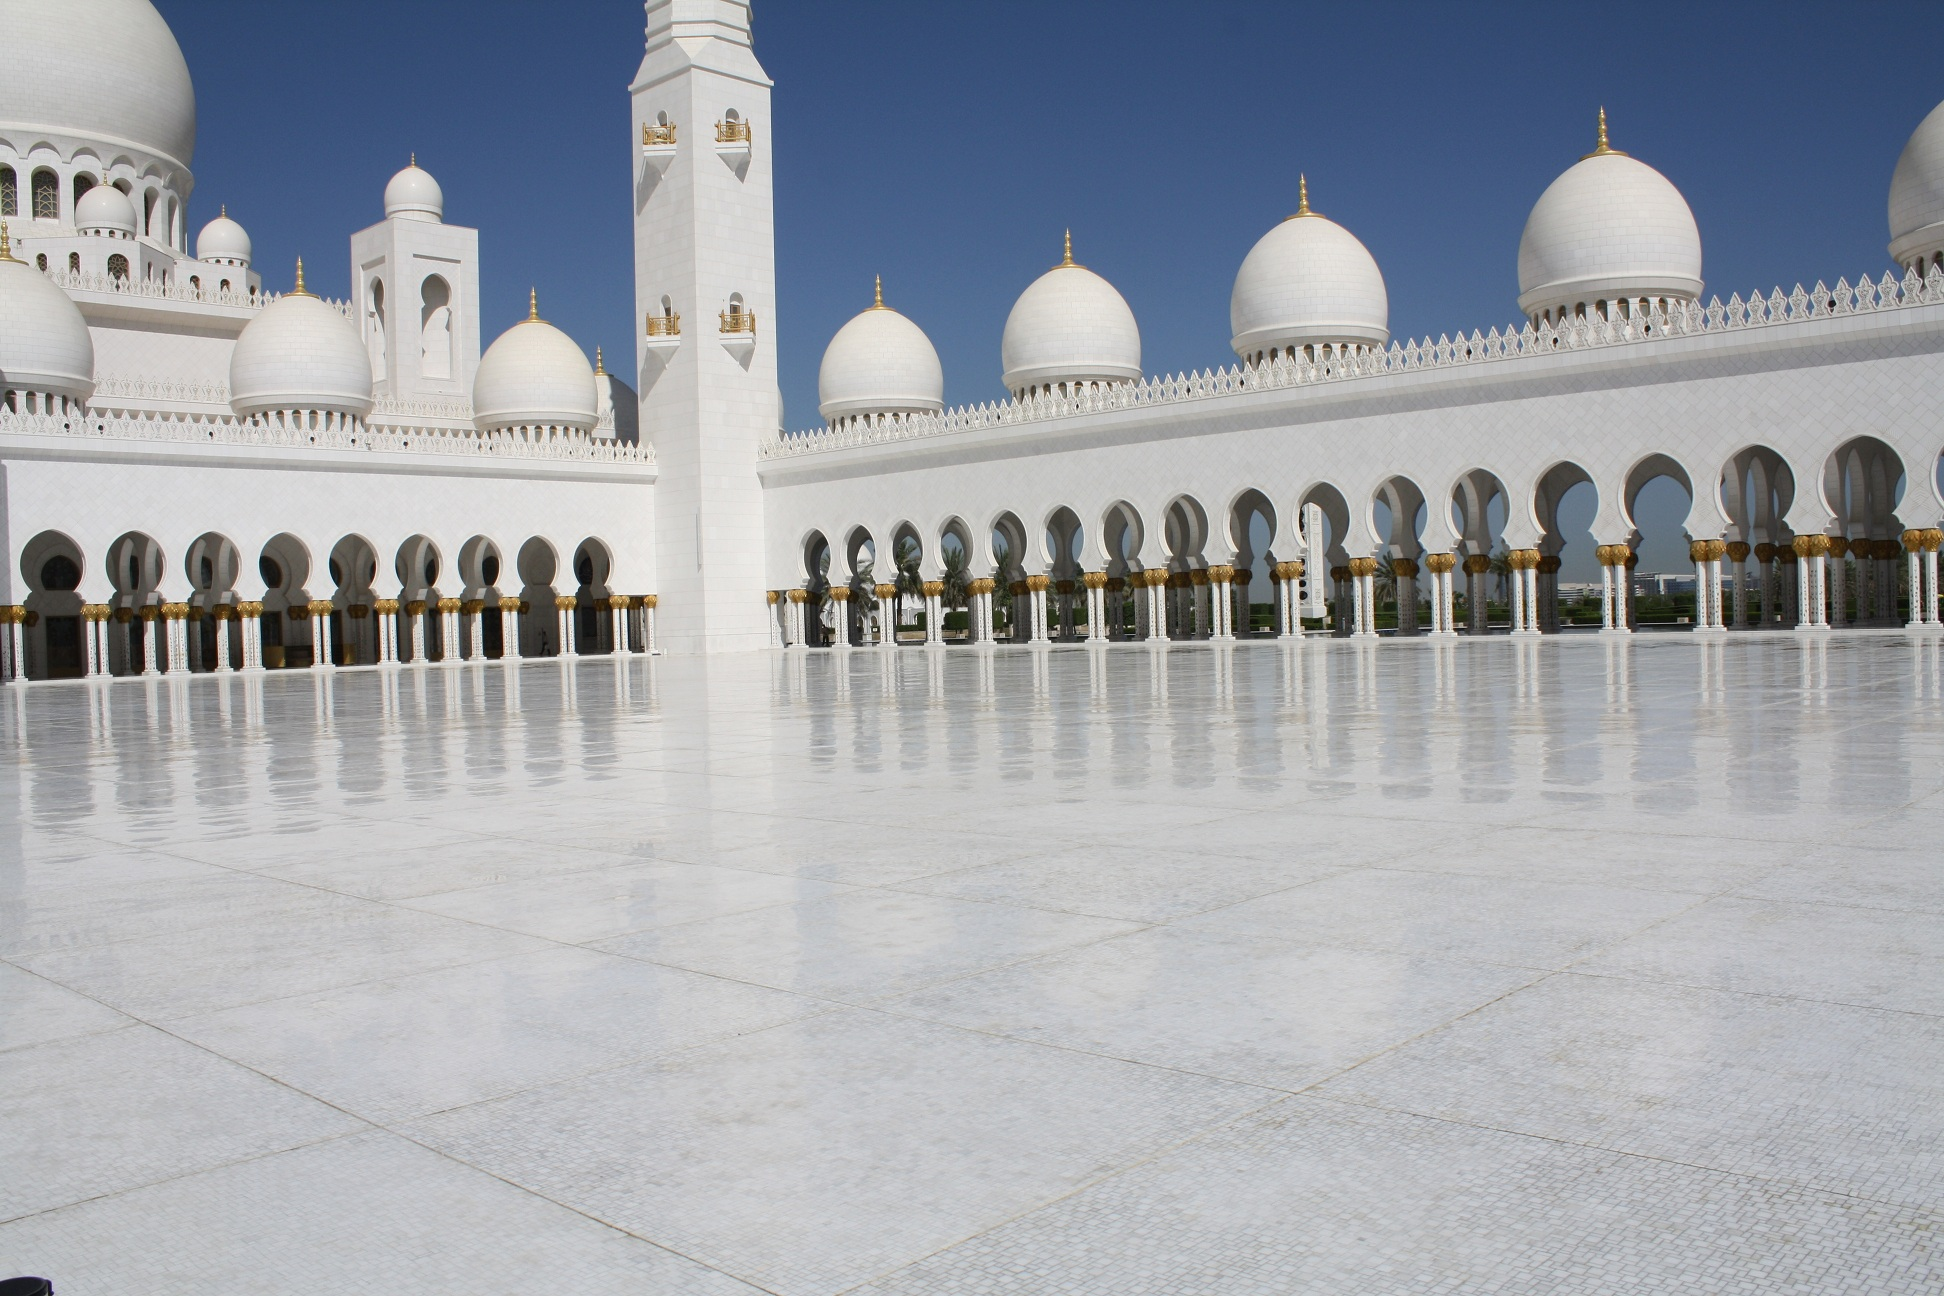 Visita alla gran moschea zayed abu dhabi sheikh zayed grand mosque rs - Abu dhabi luoghi di interesse ...